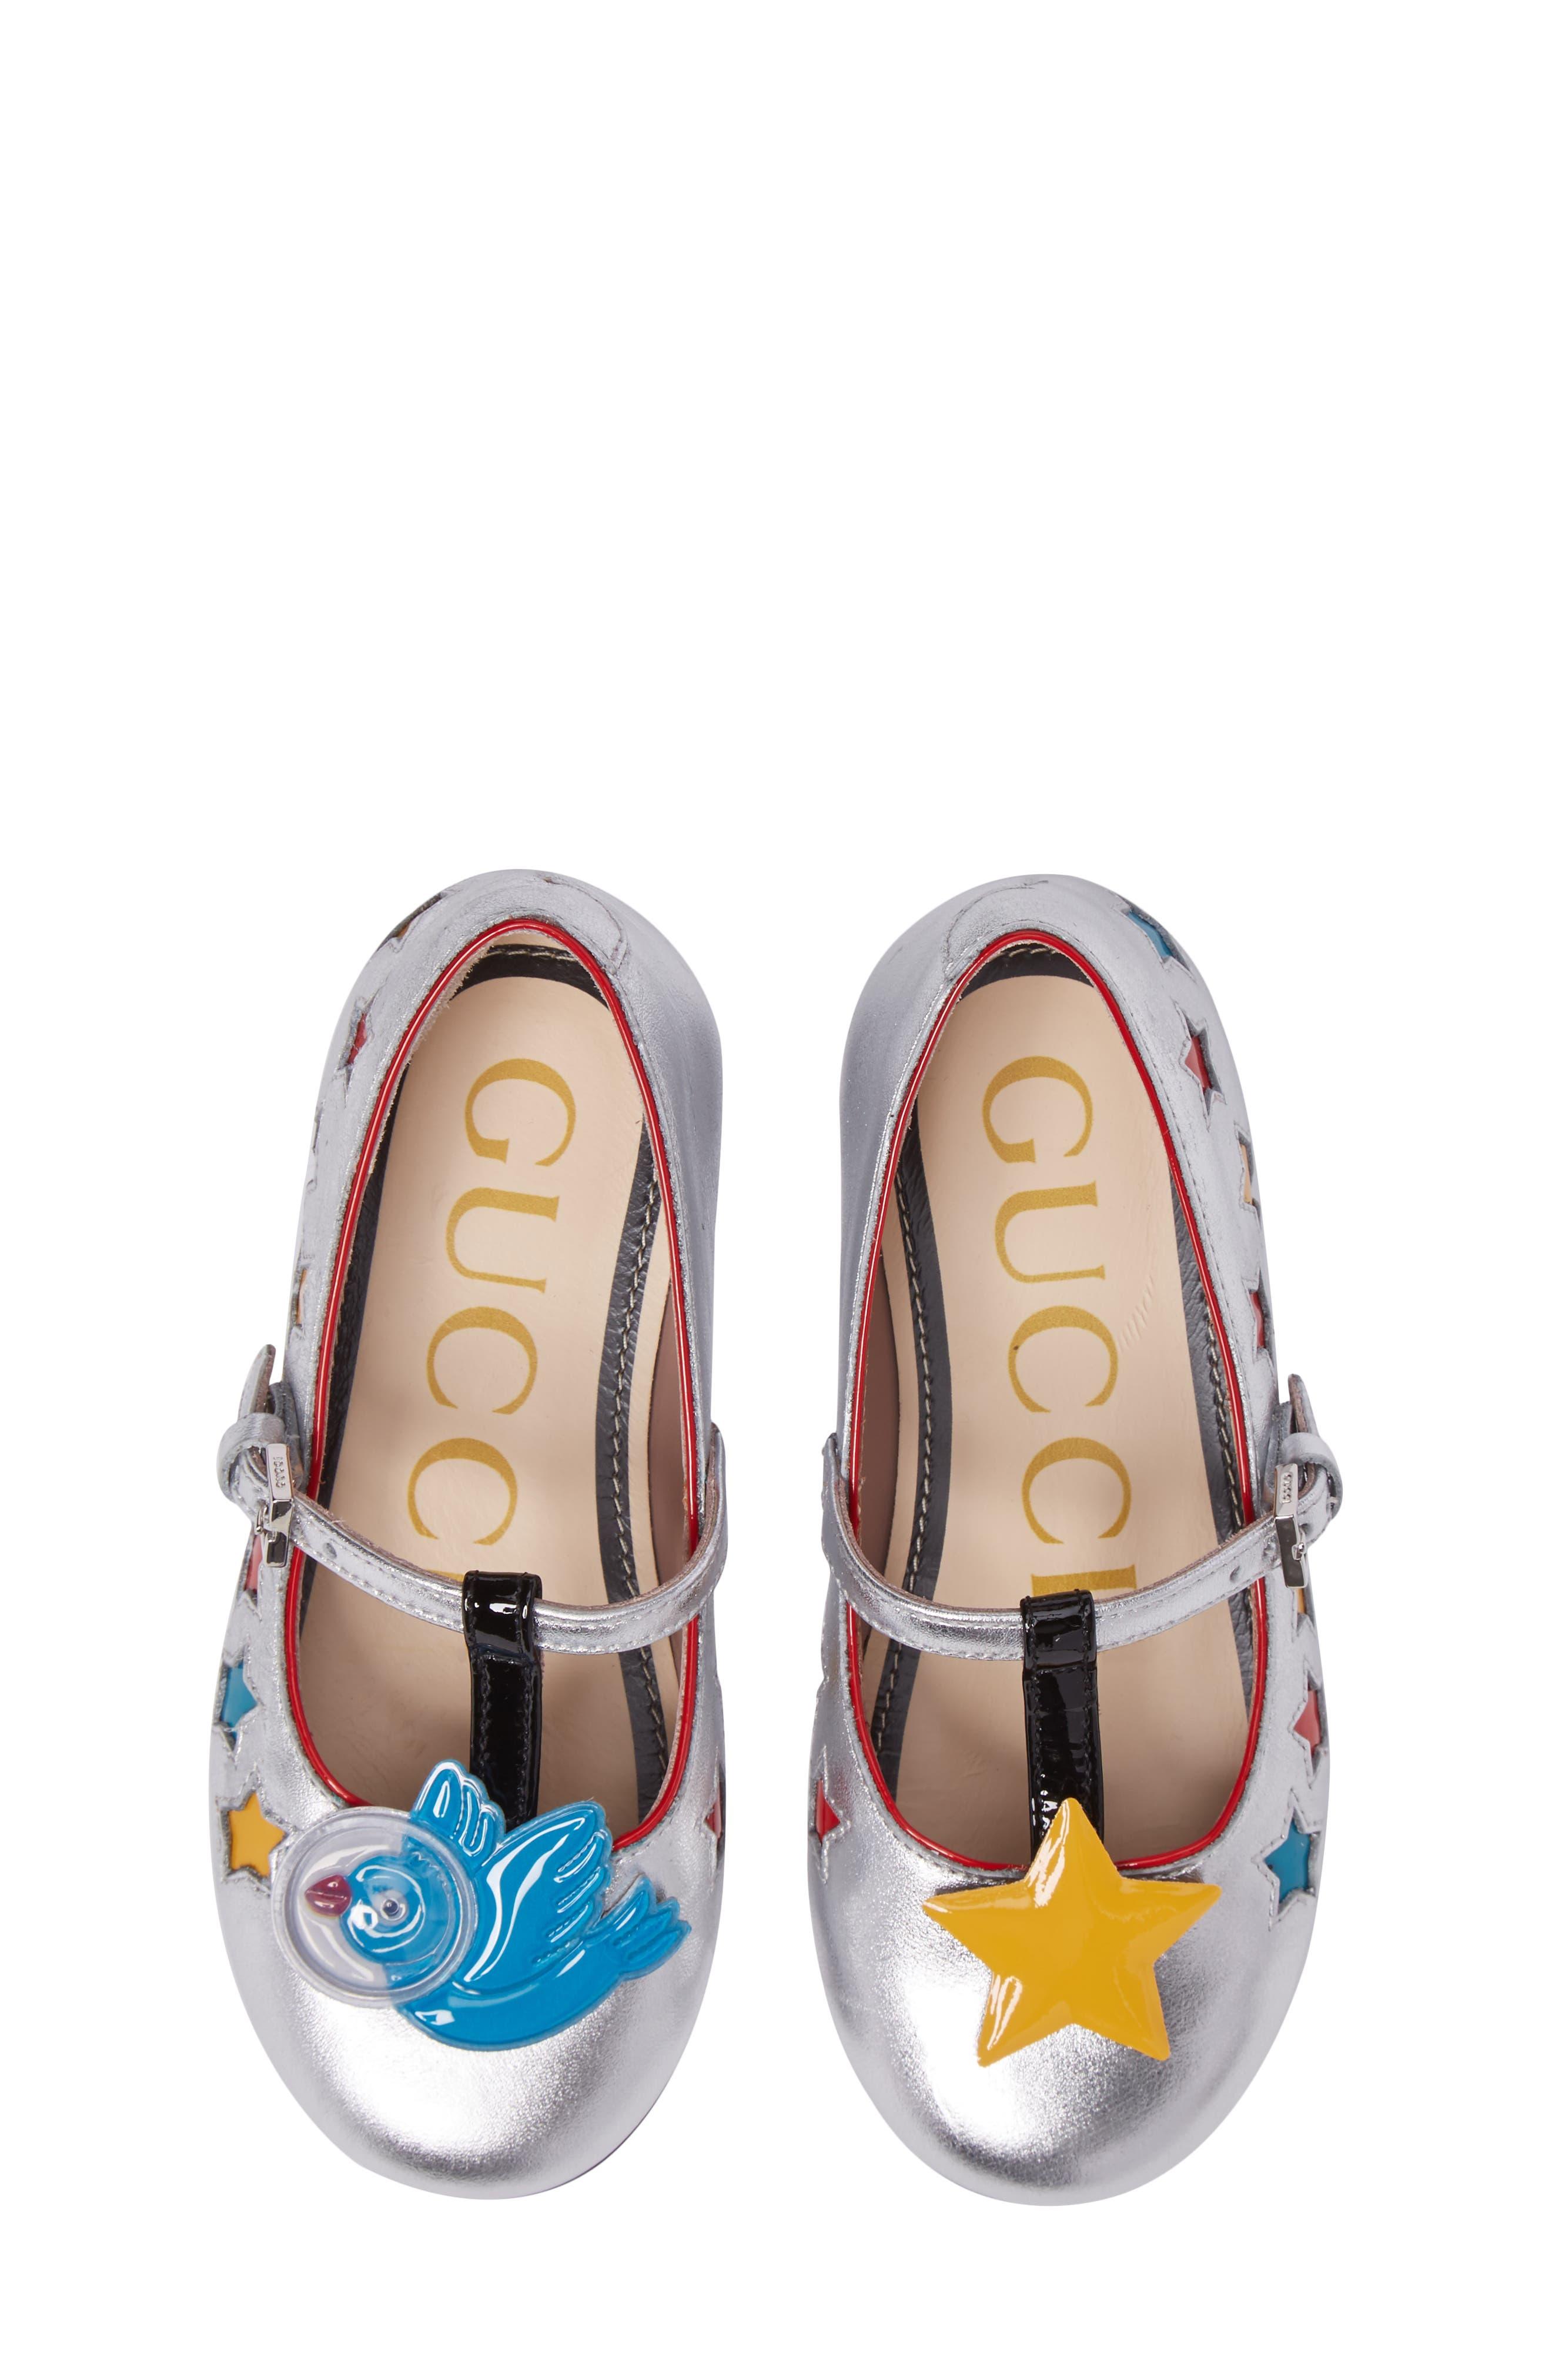 Gucci Stellar Mary Jane (Baby, Walker & Toddler)